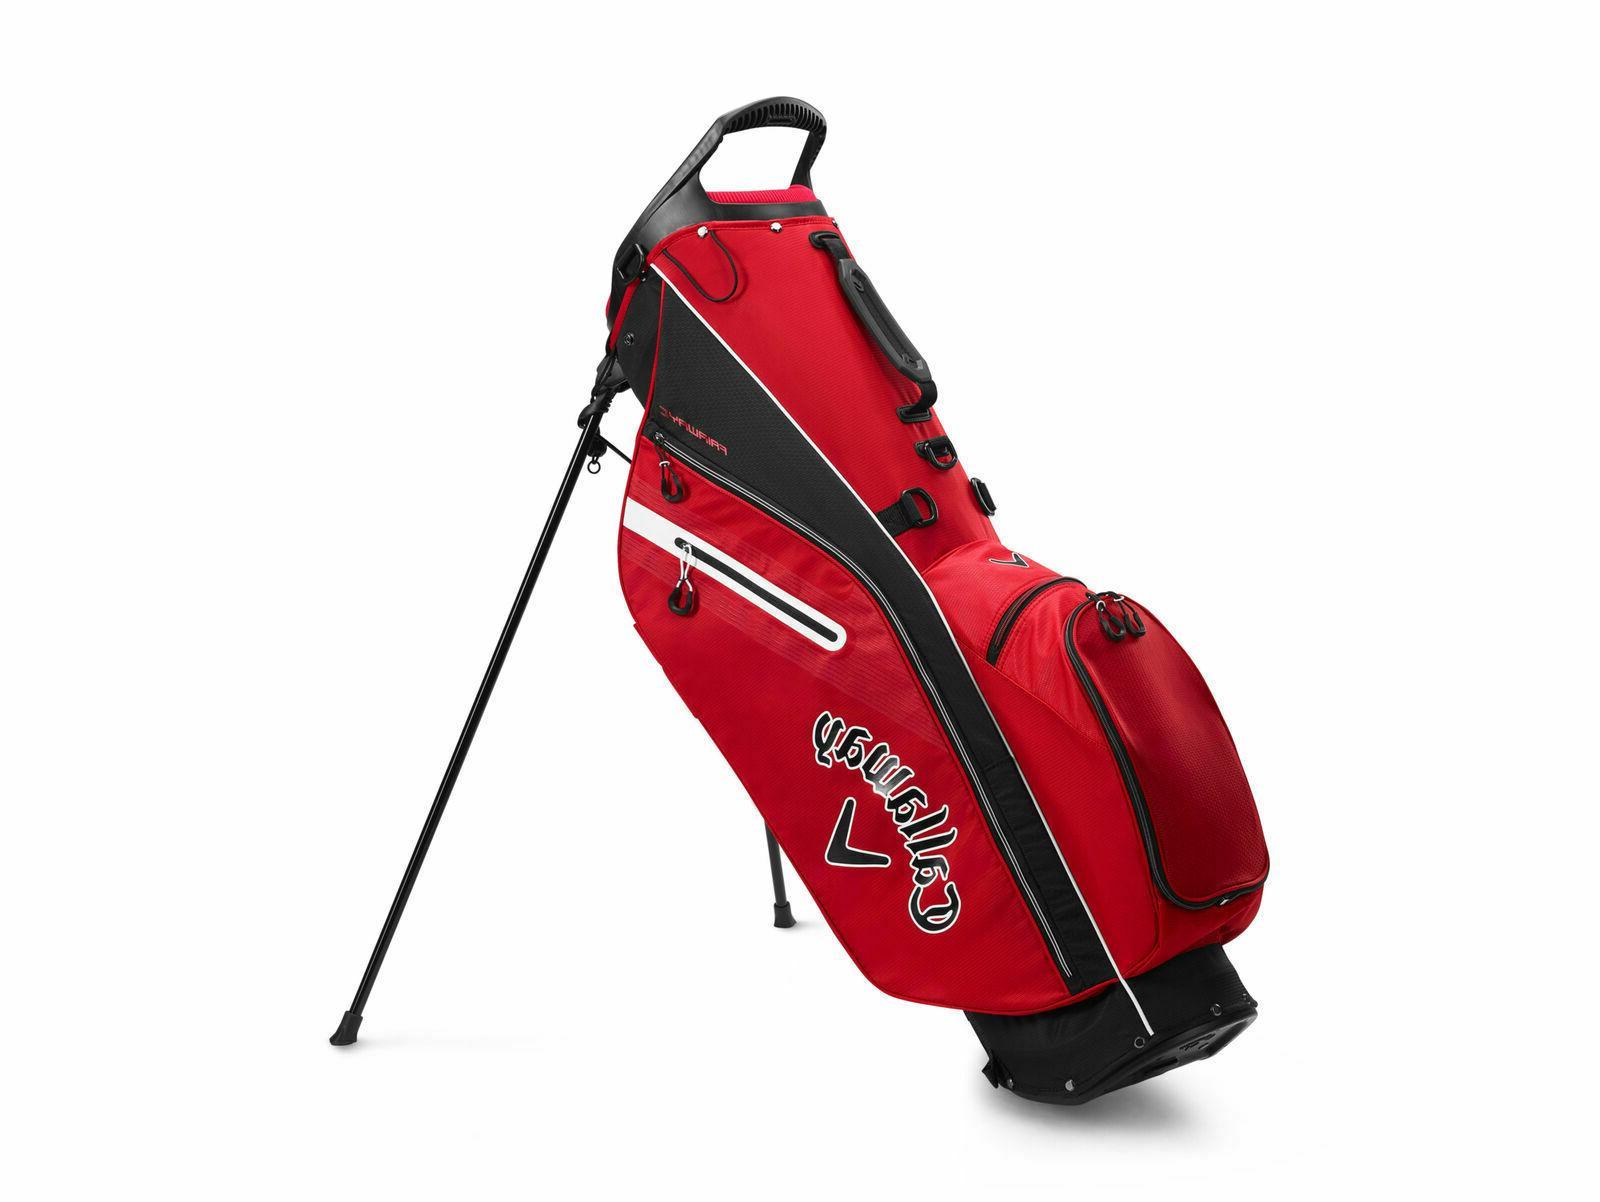 new golf 2020 fairway c stand bag